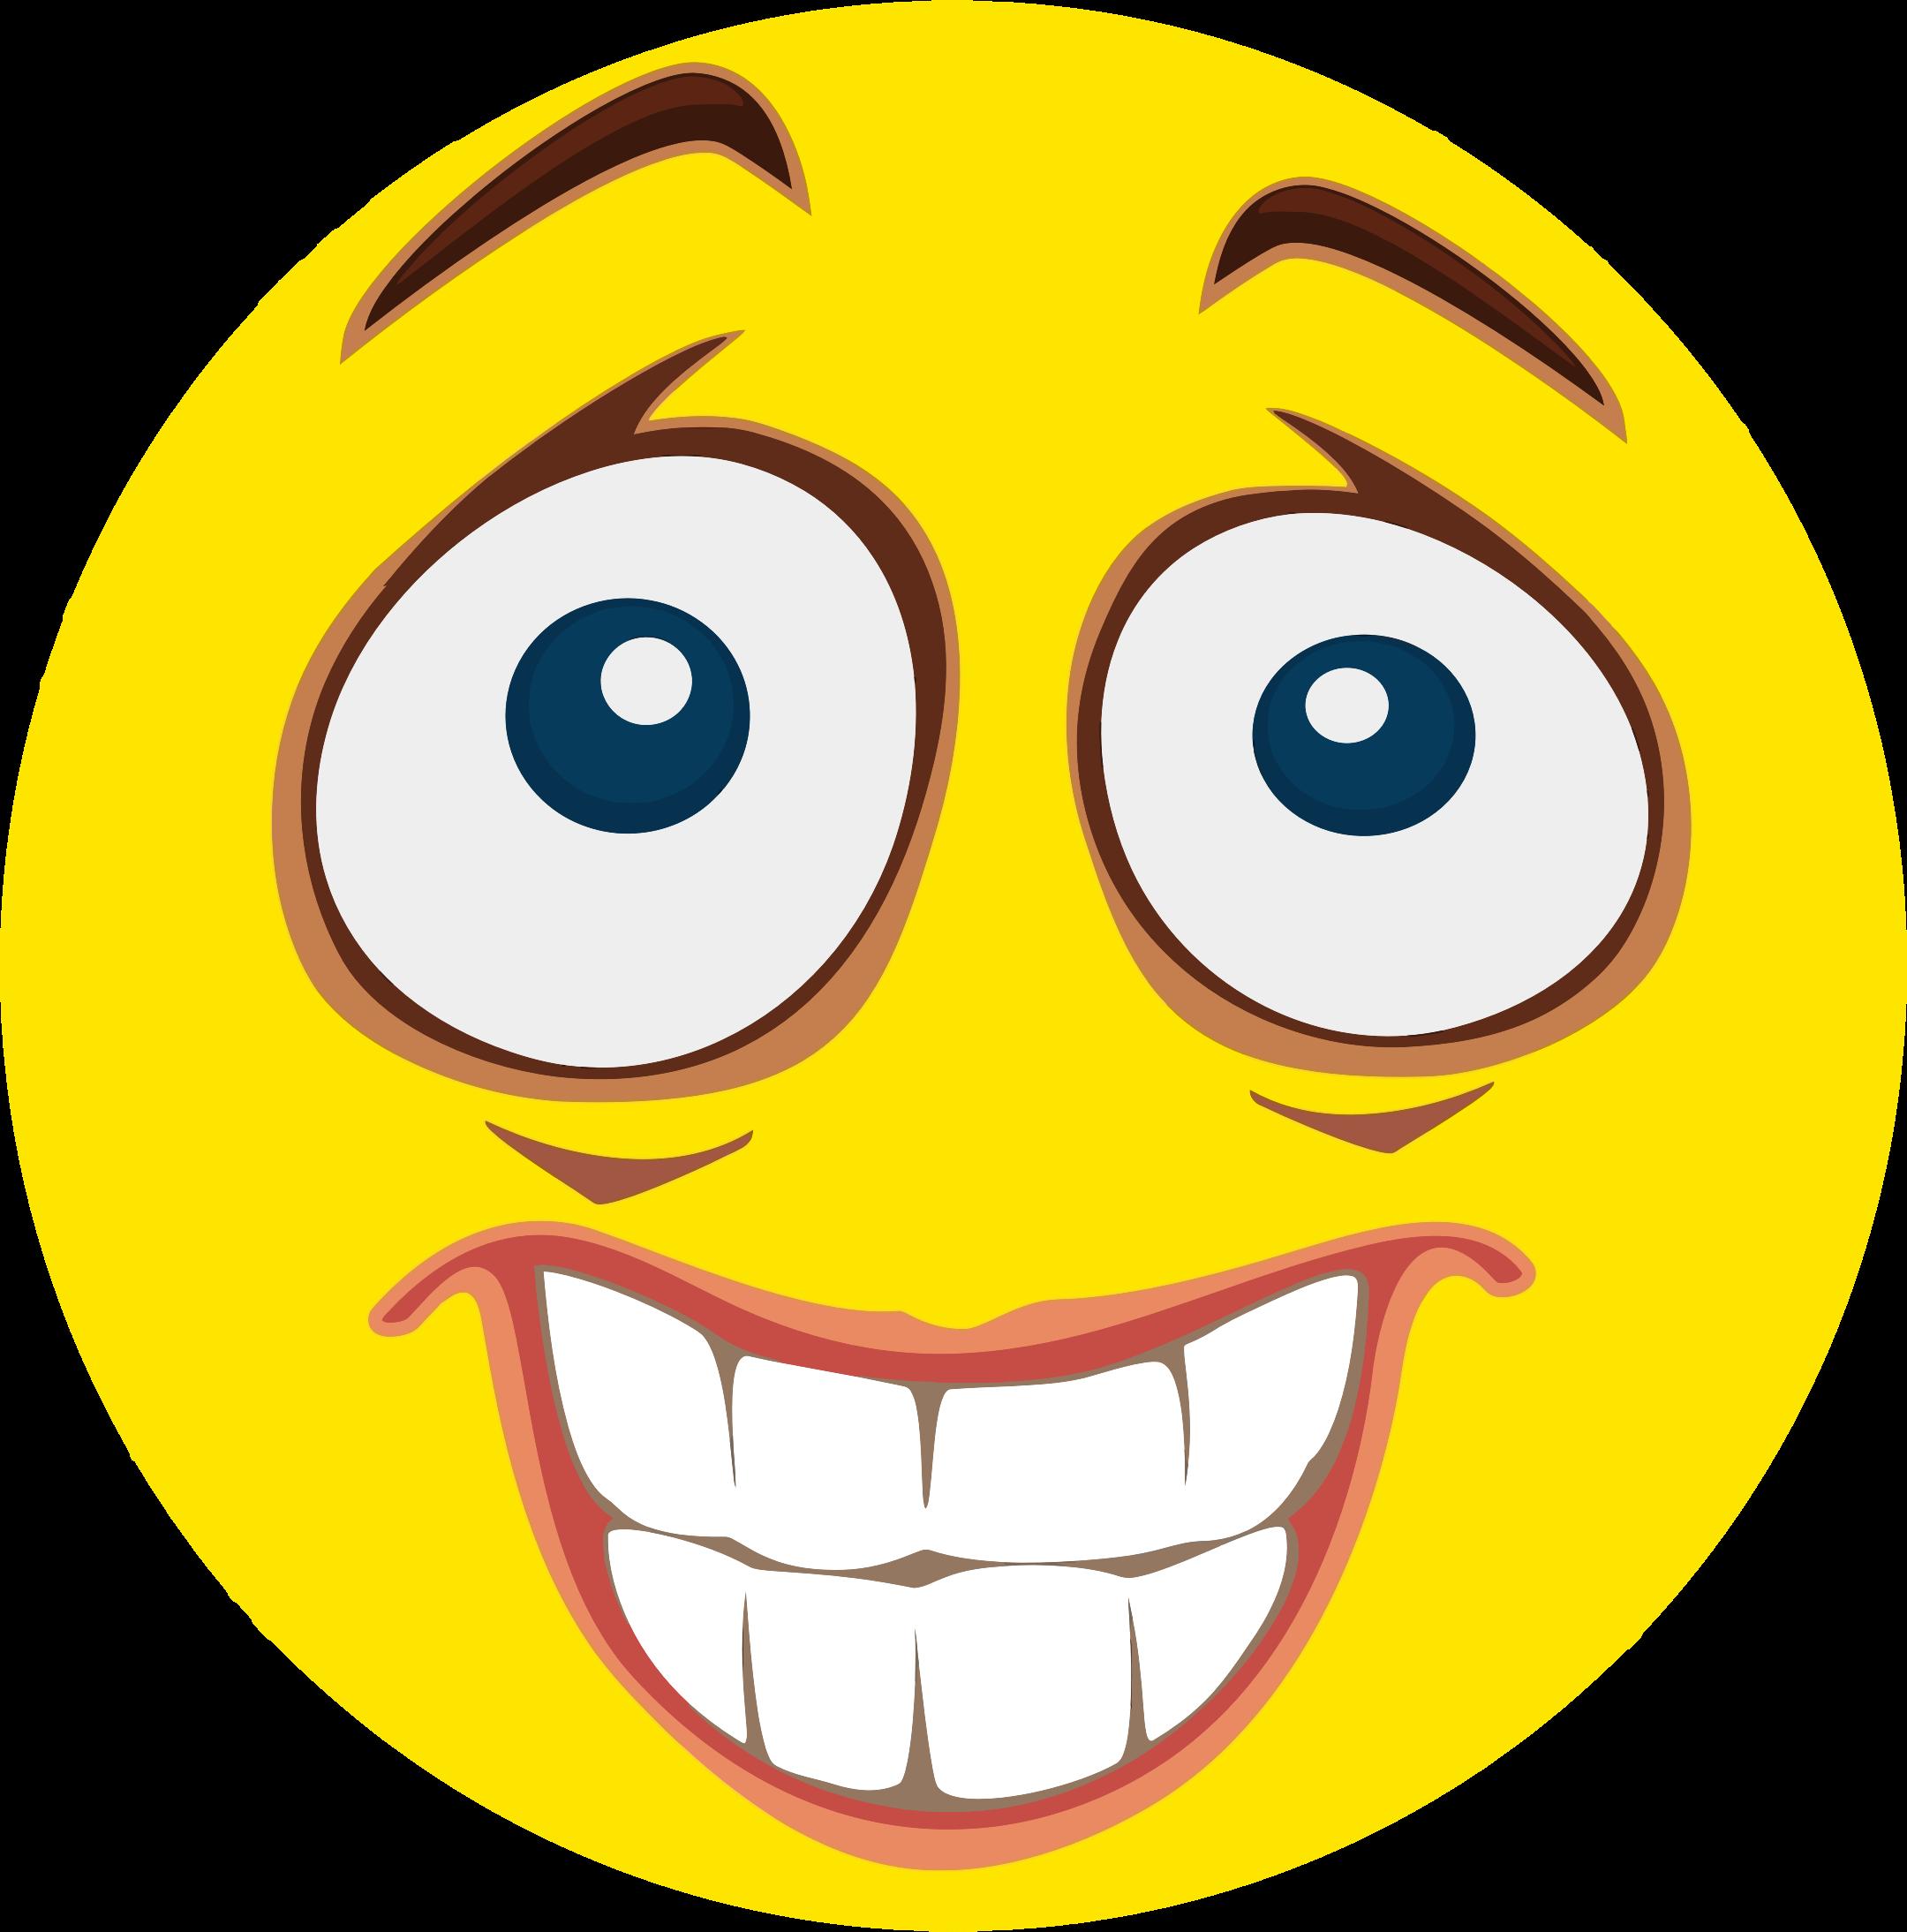 Smiley clipart nervous Smiley Nervous Clipart Smiley Nervous